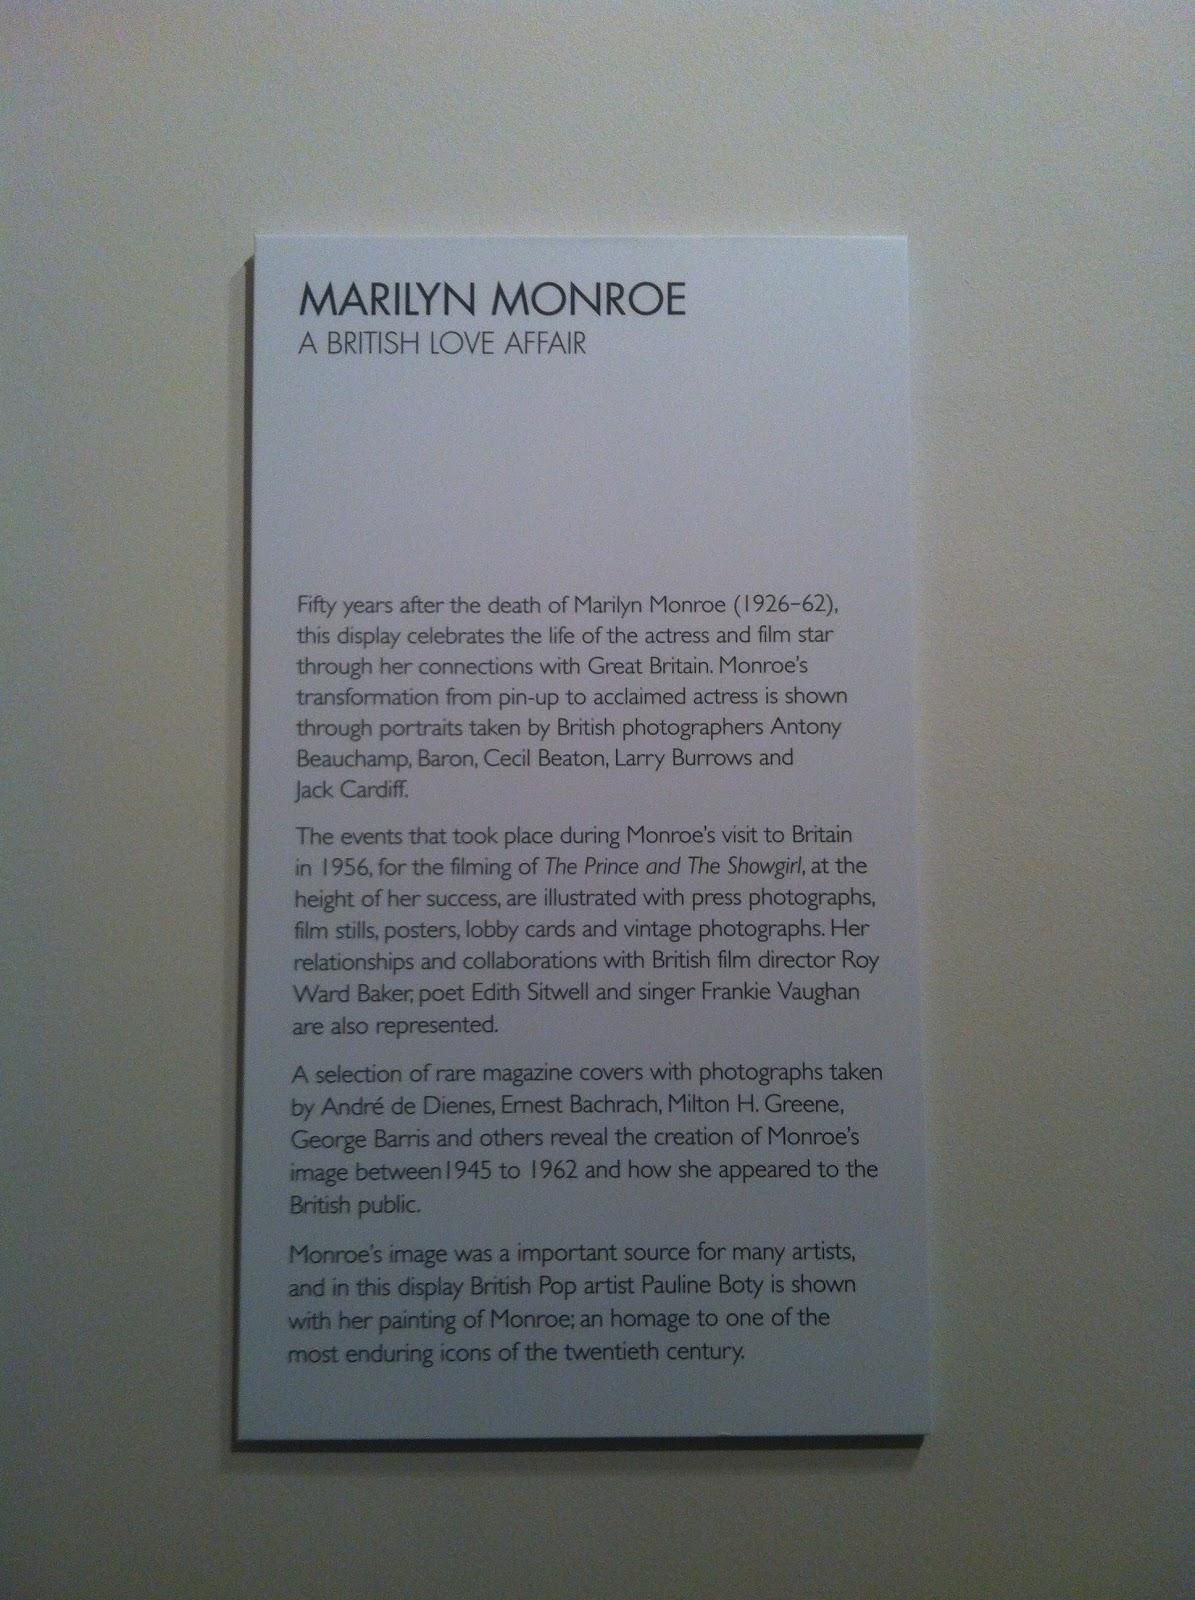 Marilyn Monroe Living Room Decor: Living.in.a.fashion.world: Marilyn Monroe: A British Love